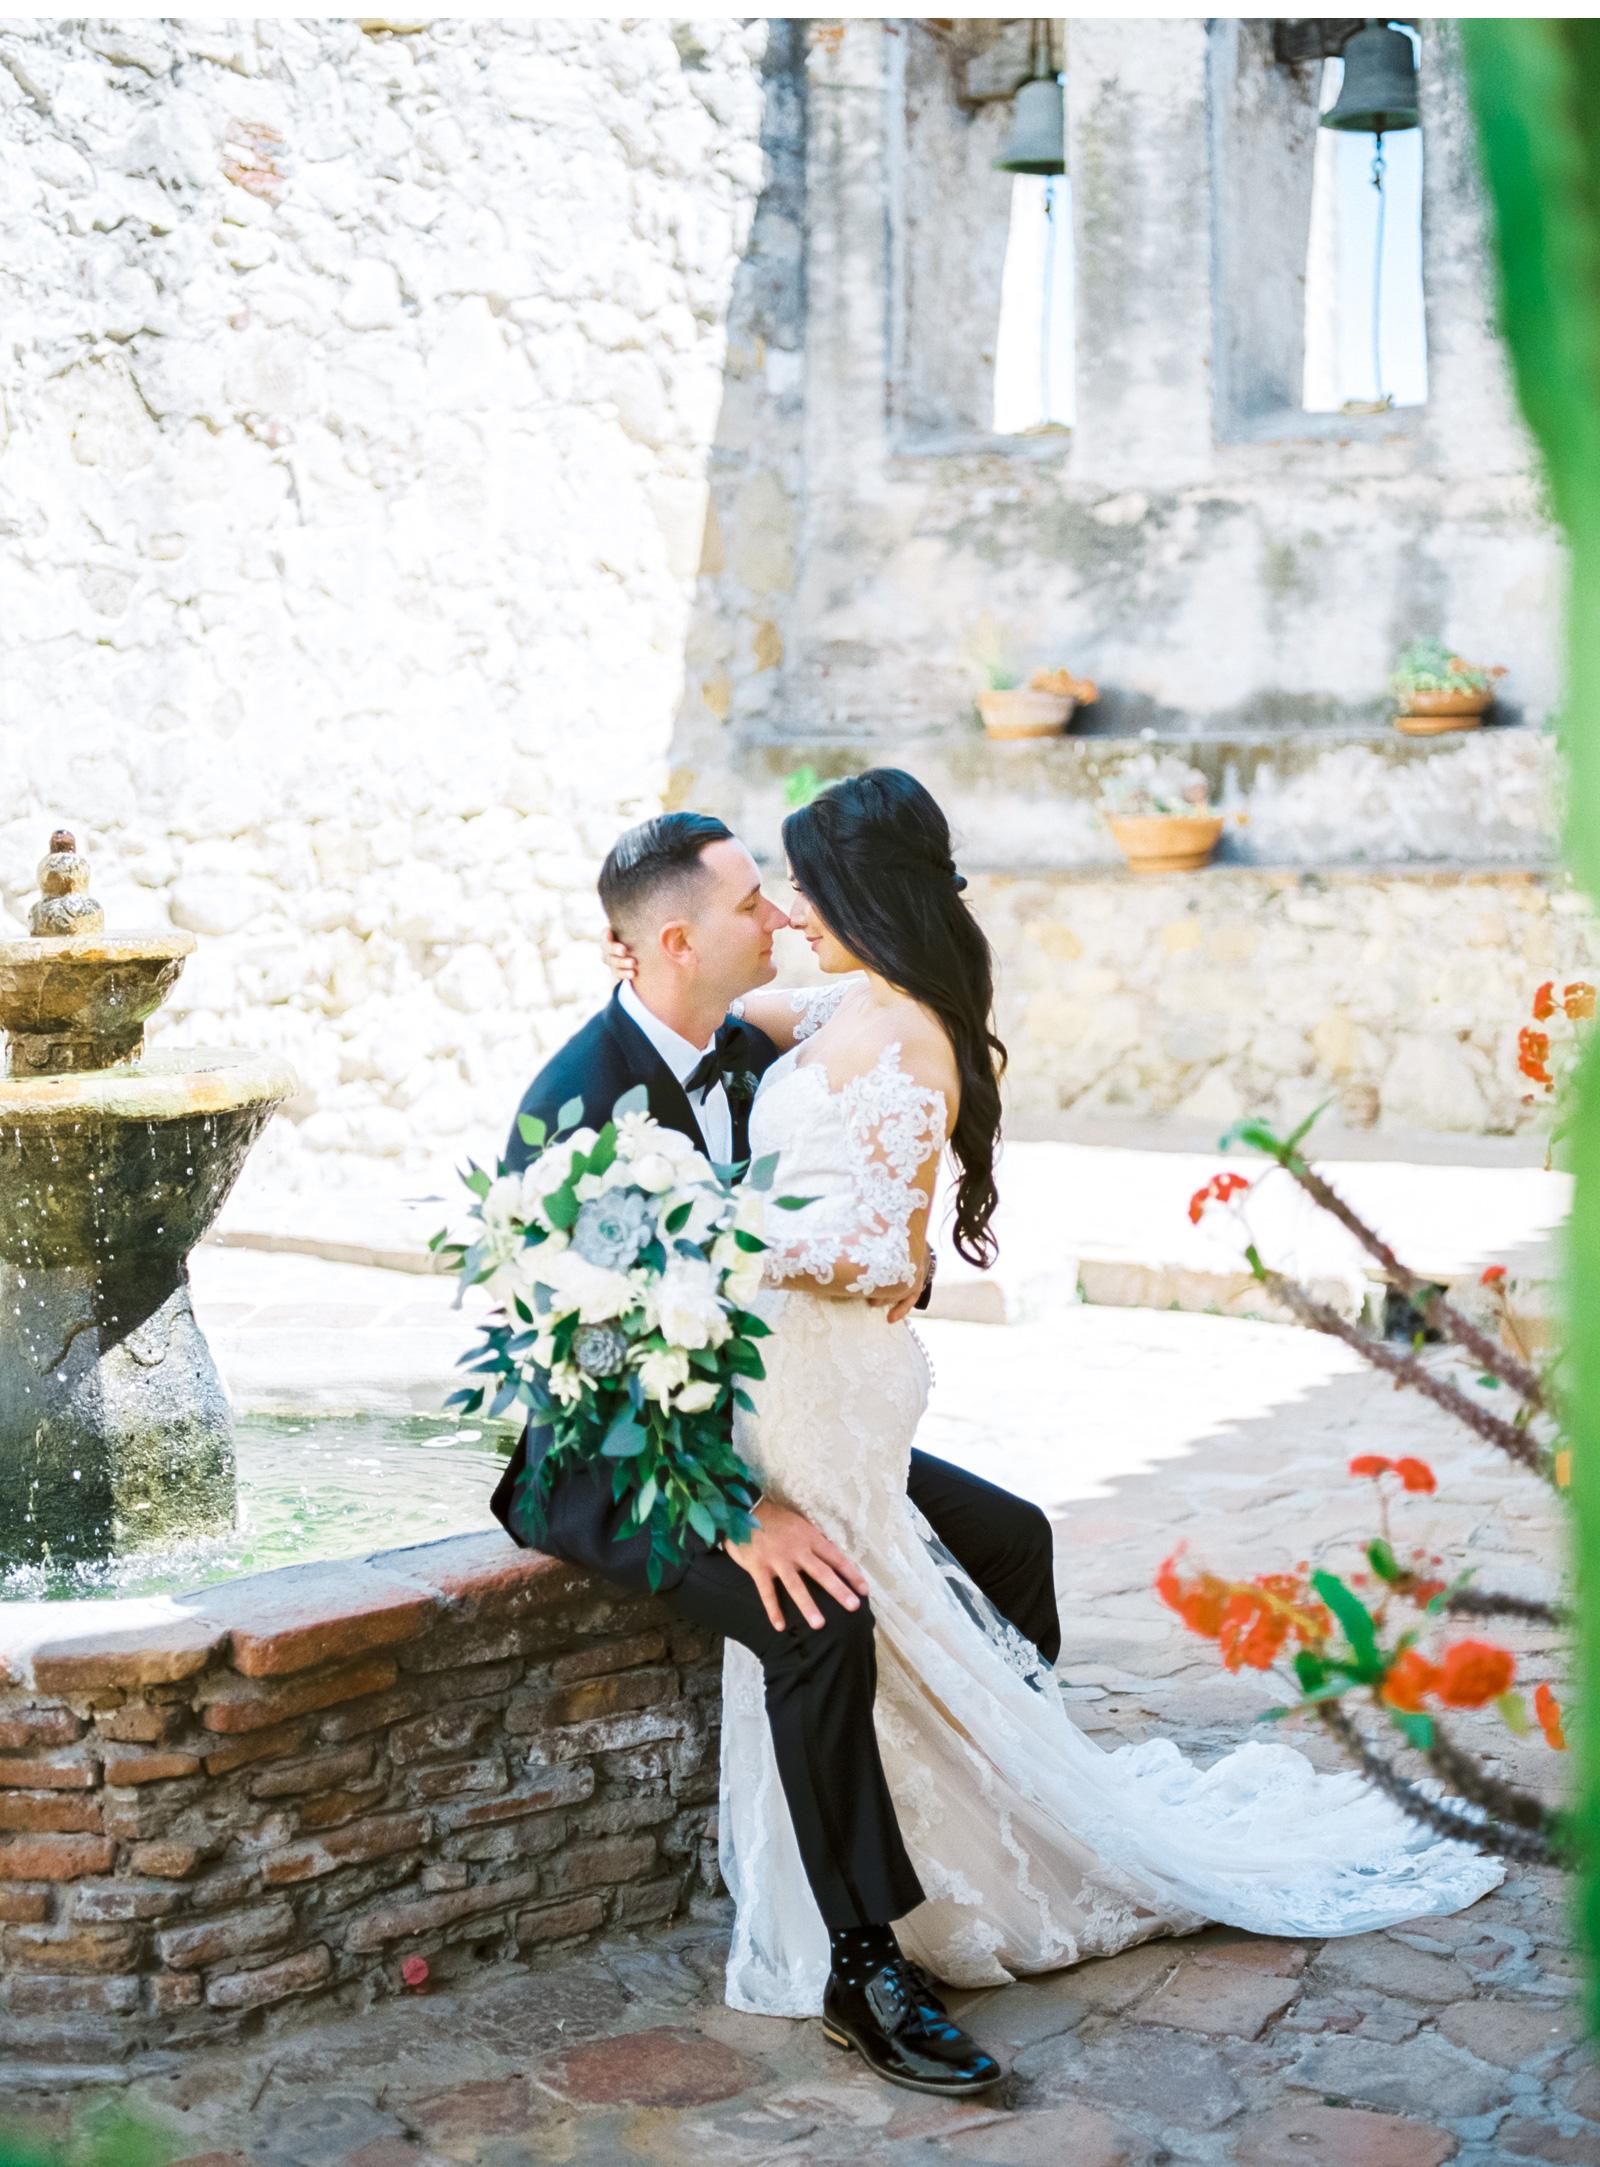 Malibu-Weddings-Natalie-Schutt-Photography_02.jpg